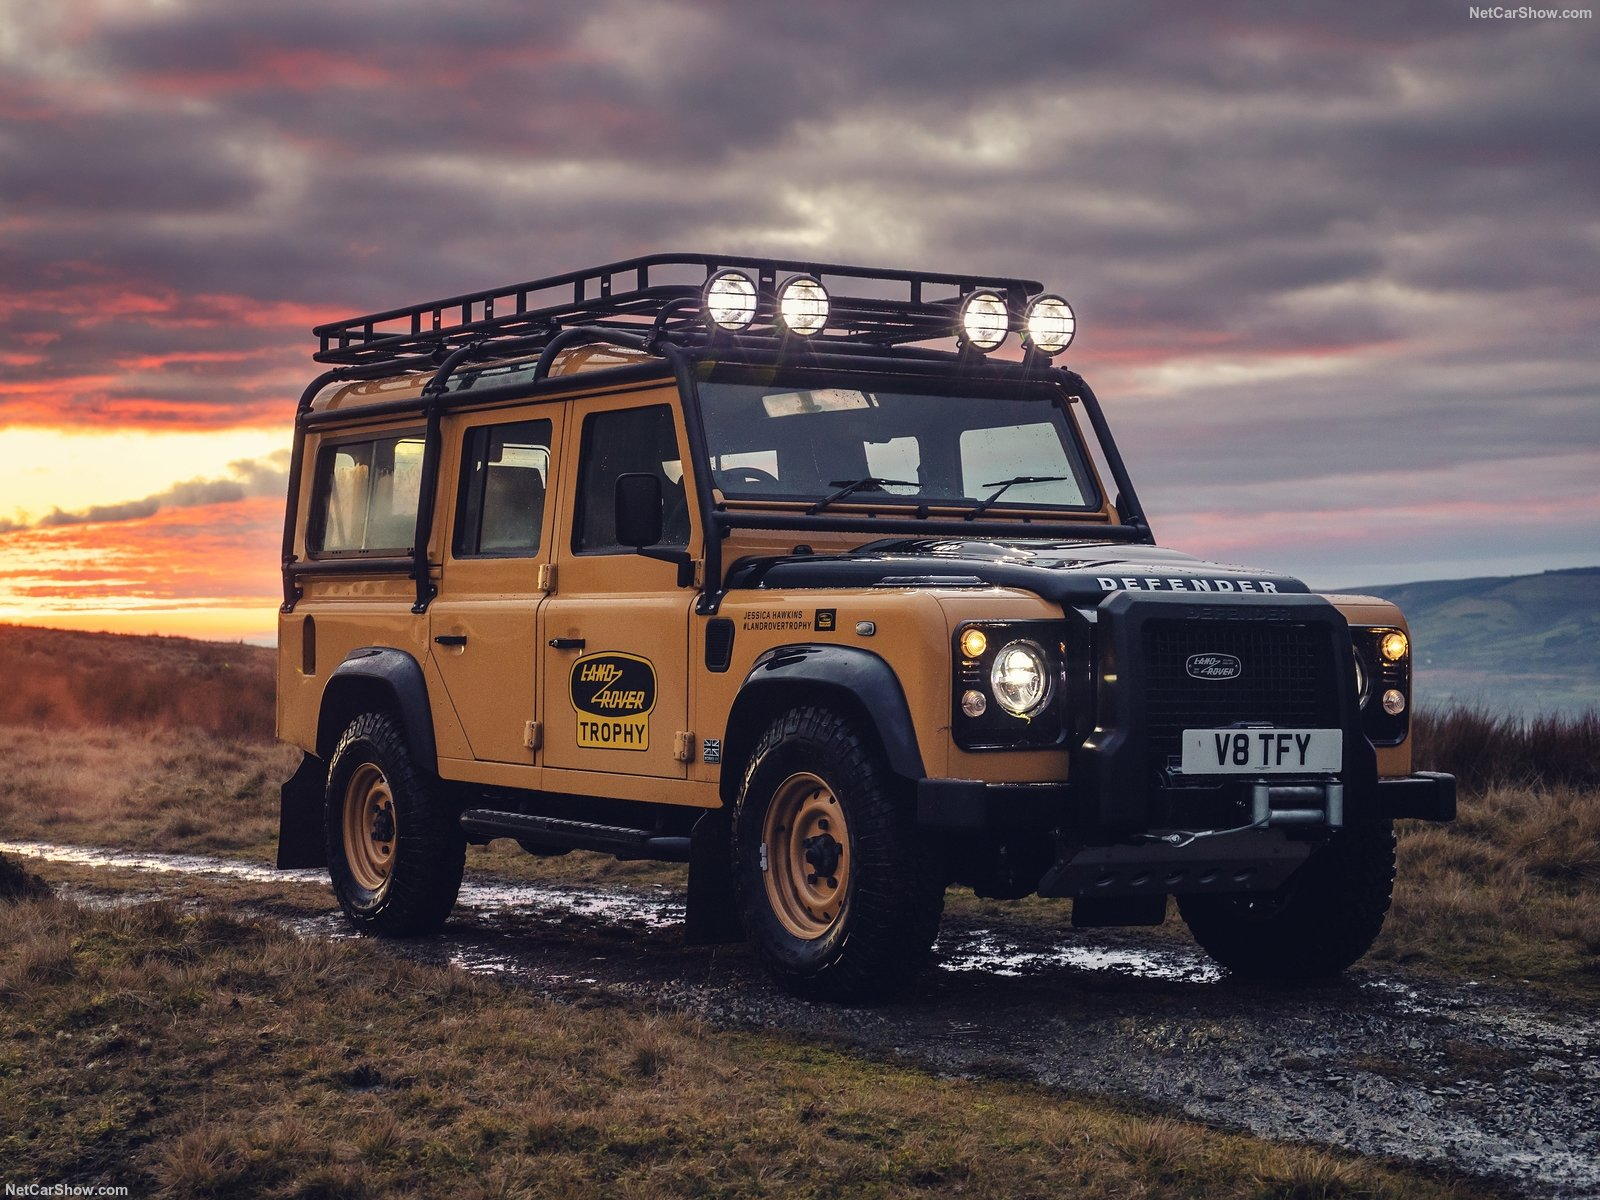 Serie Land Rover Defender limitata a 25 esemplari